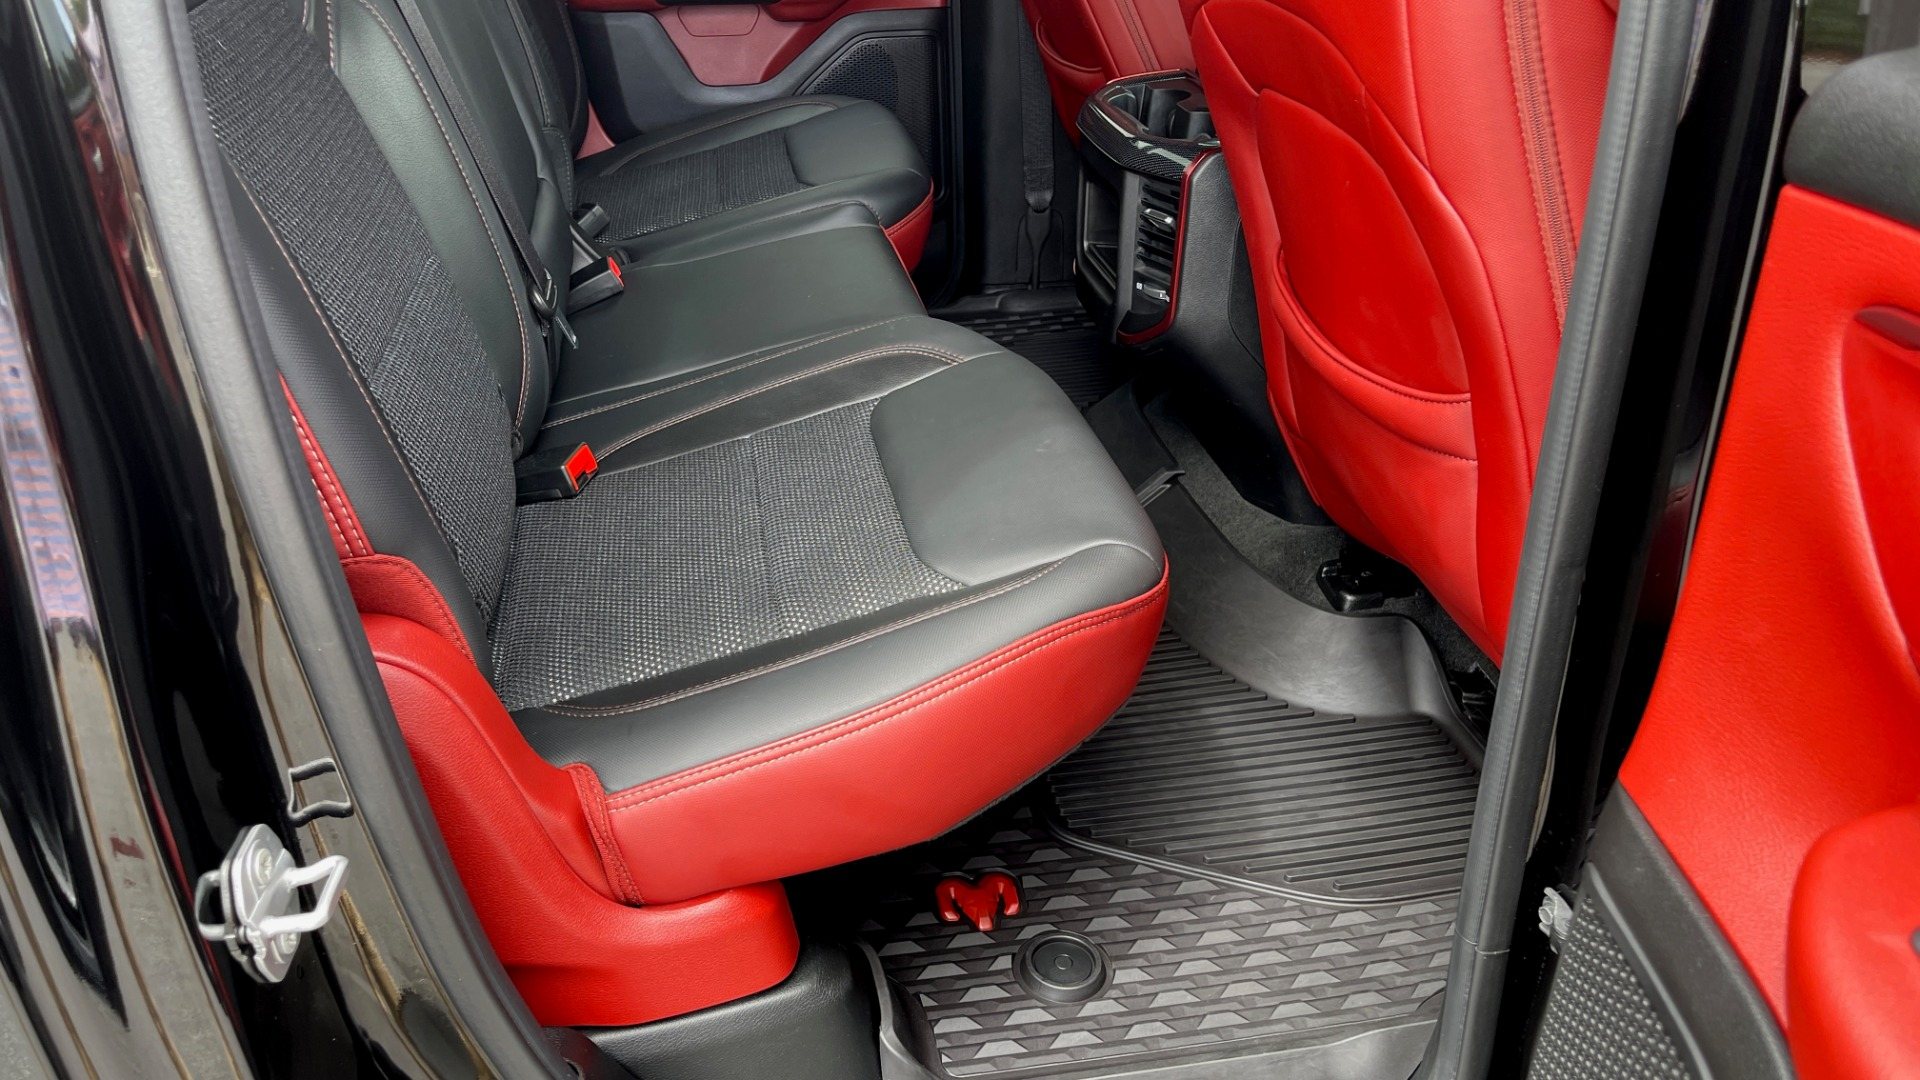 Used 2019 Ram 1500 REBEL QUADCAB 4X4 / 5.7L HEMI / 8-SPD AUTO / REMOTE START / PARK ASSIST for sale $44,495 at Formula Imports in Charlotte NC 28227 60